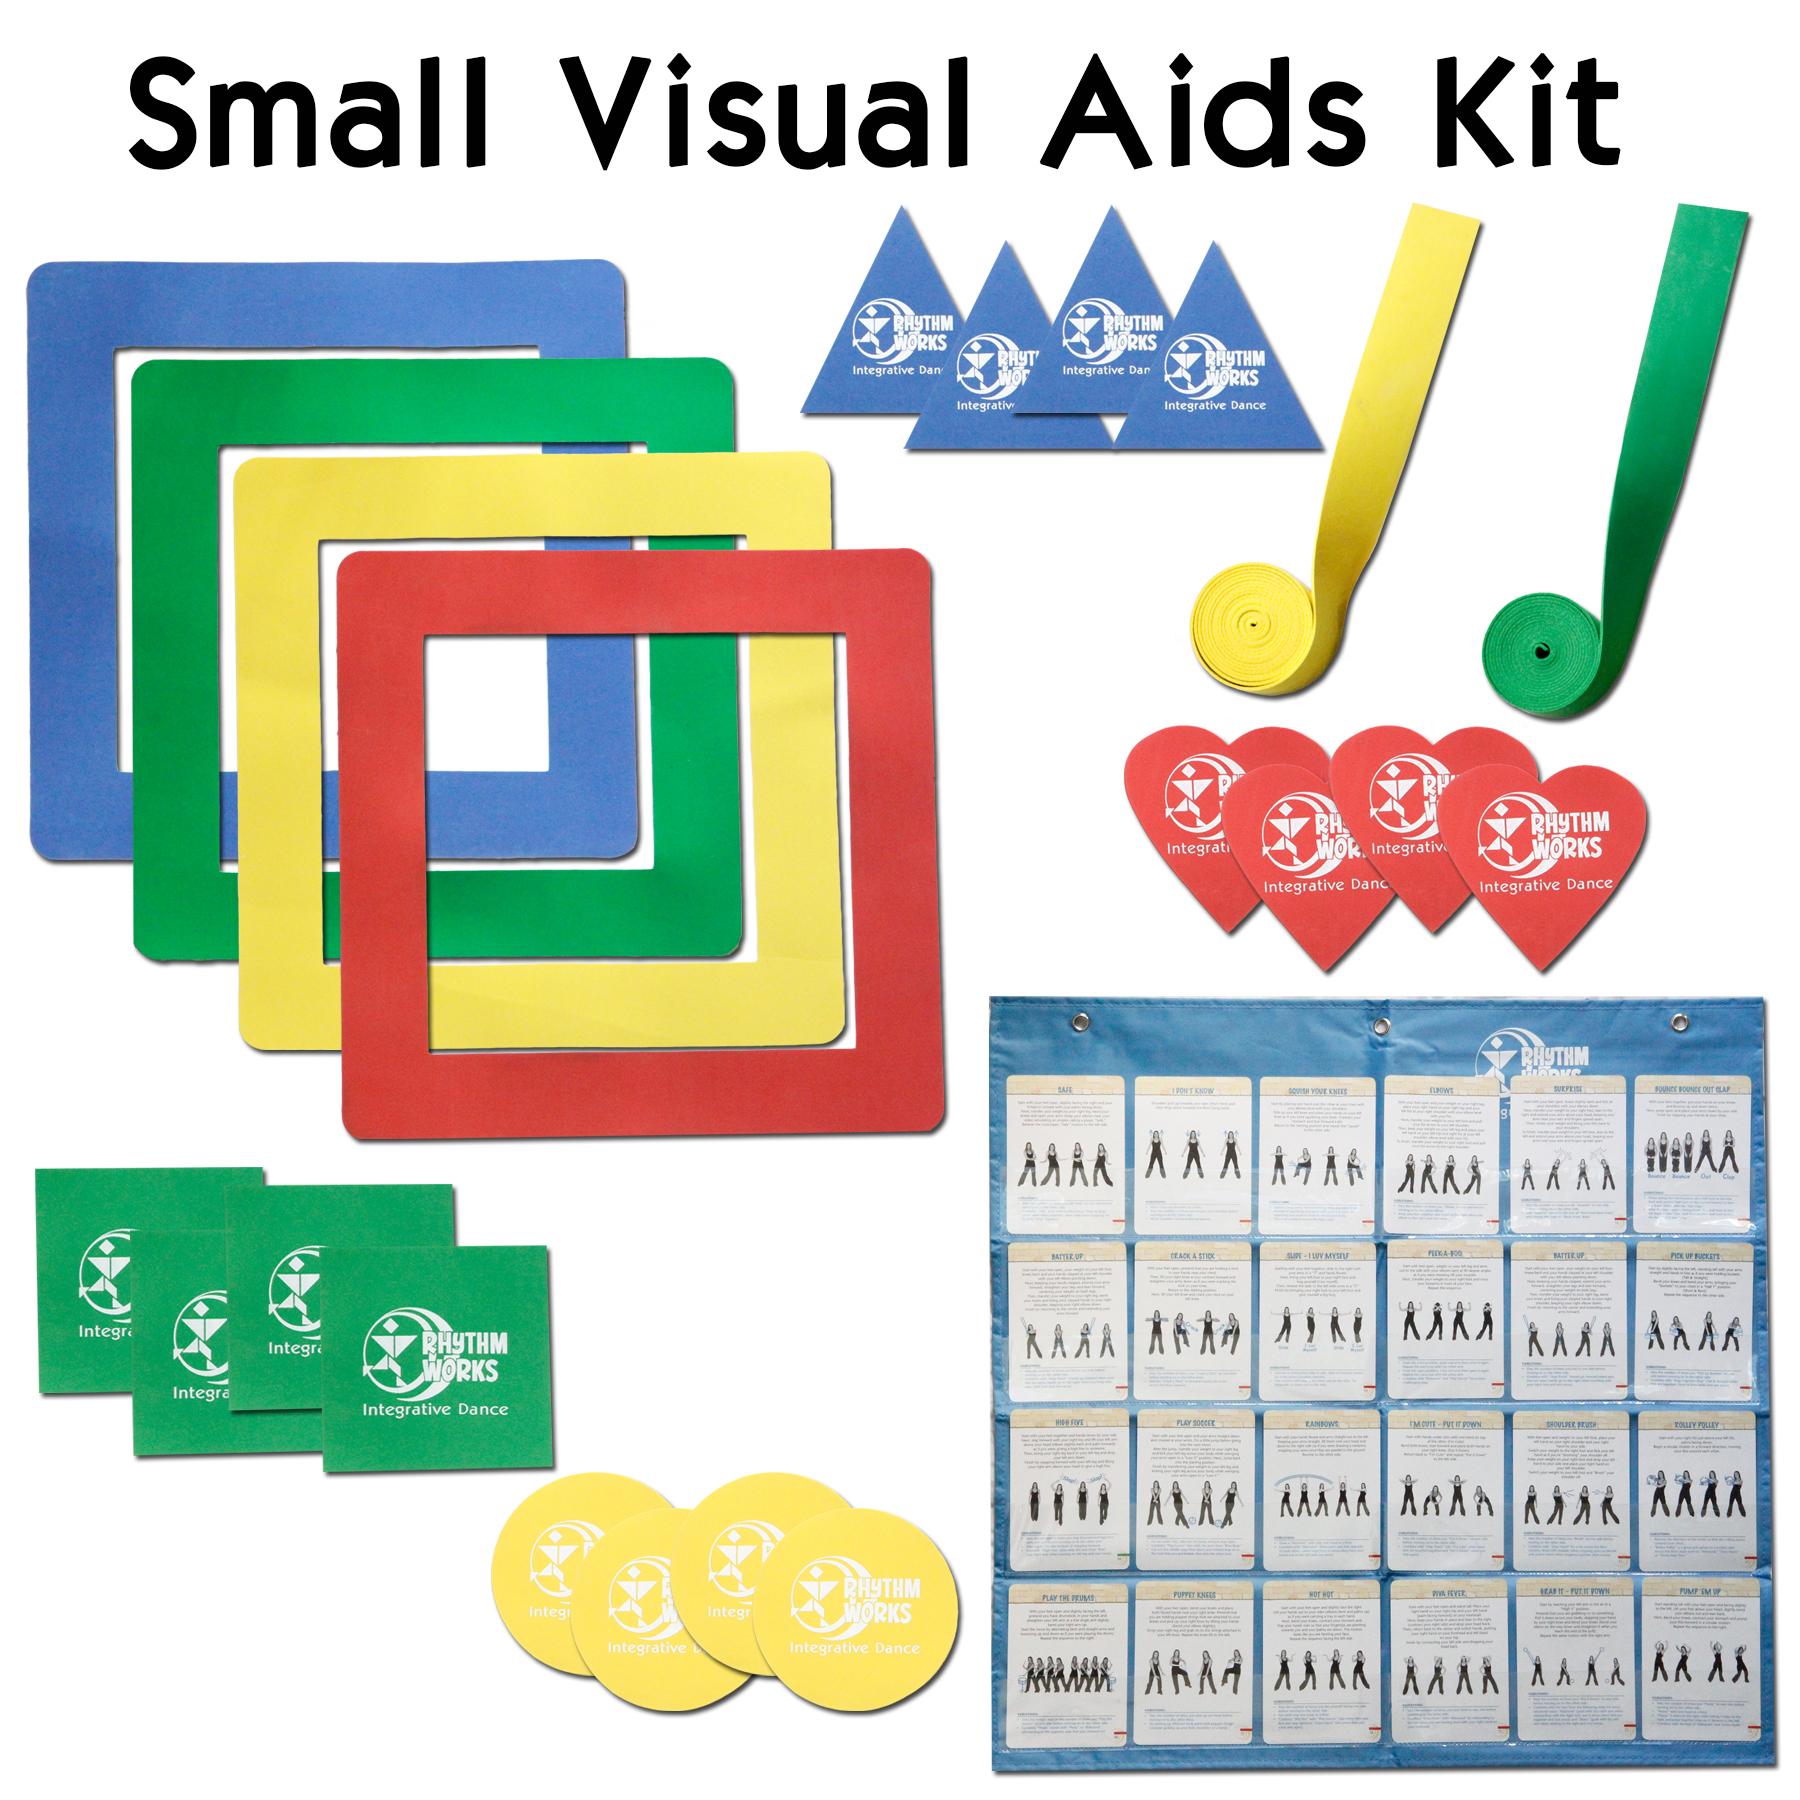 Visual Aids Kit Options